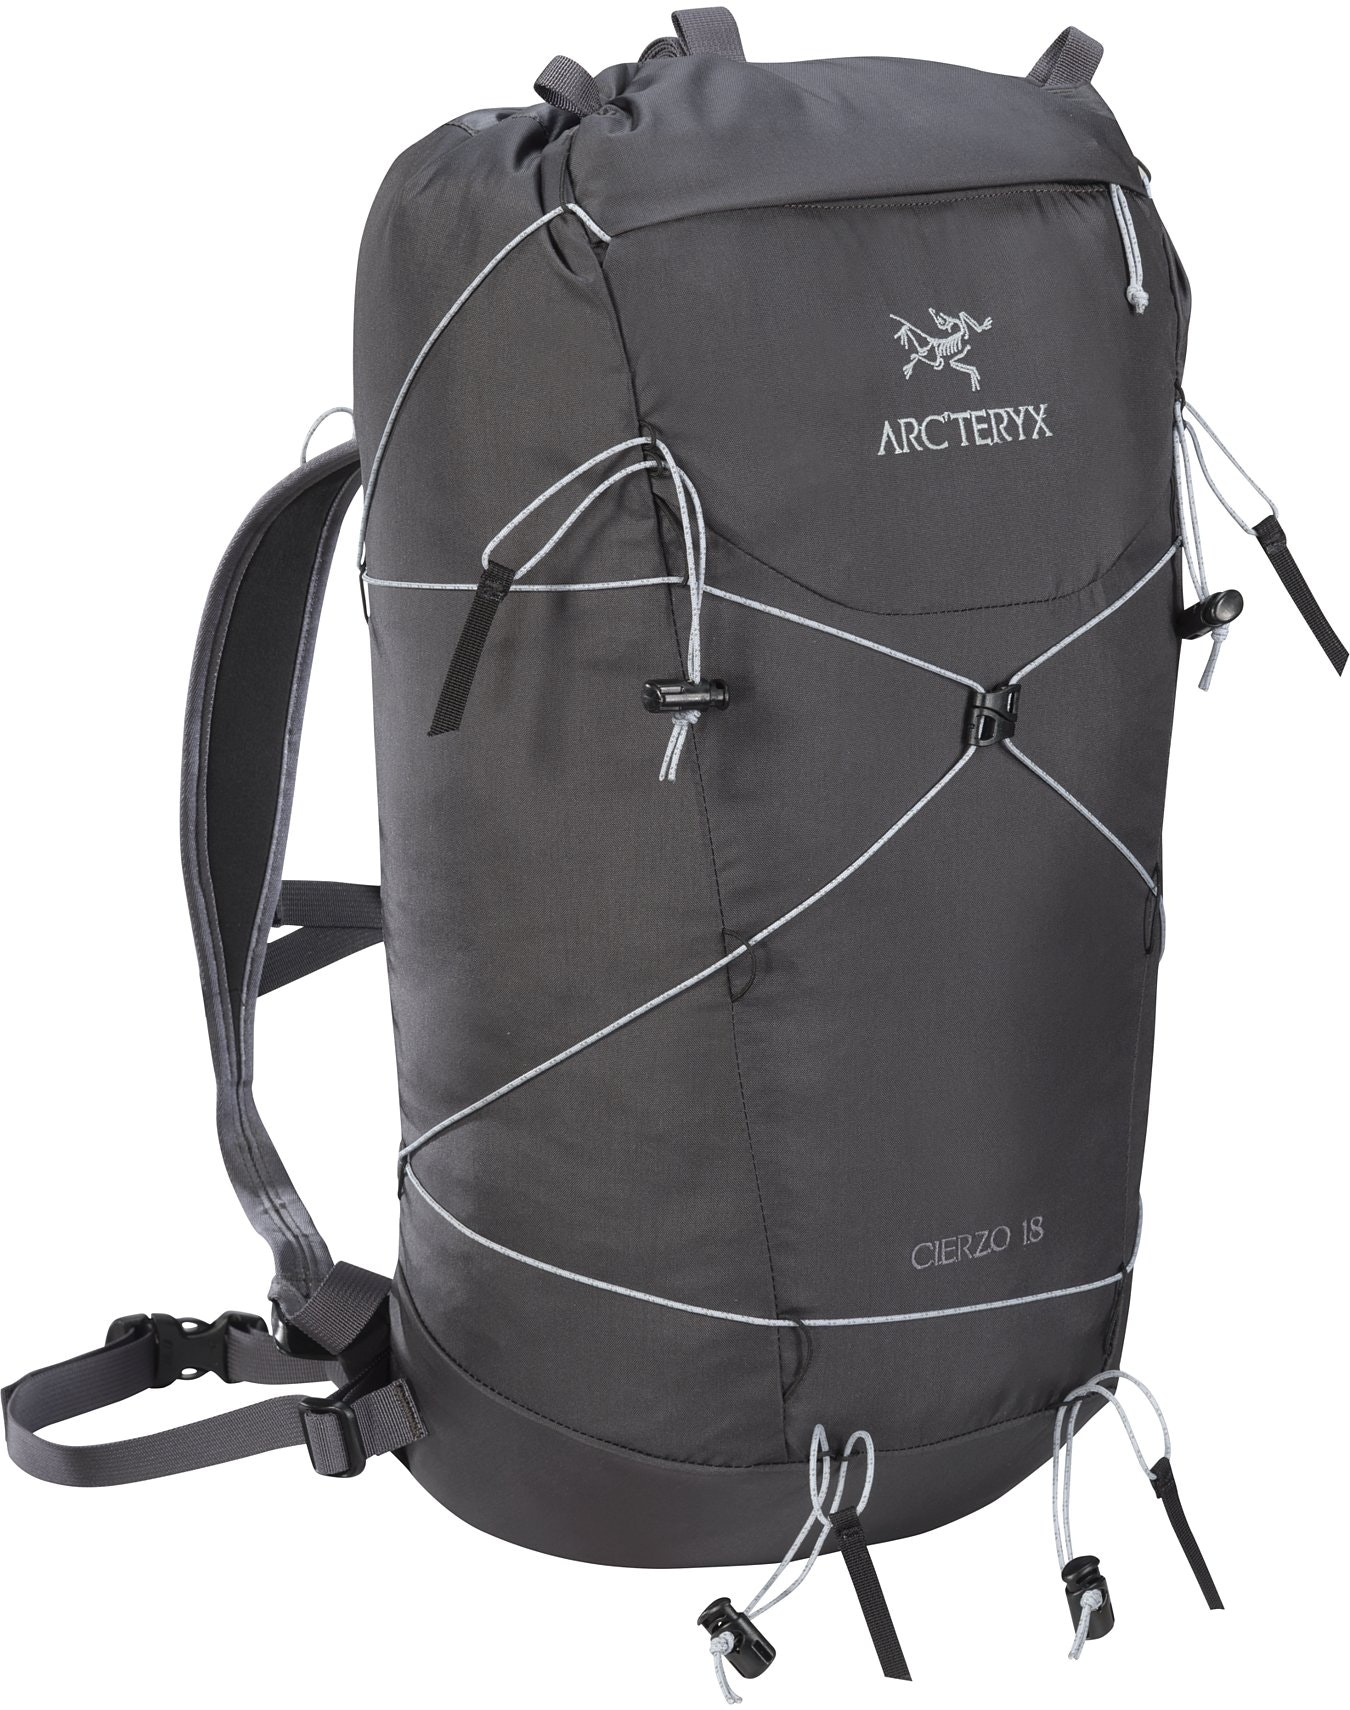 Cierzo 18 Backpack / Arc\'teryx